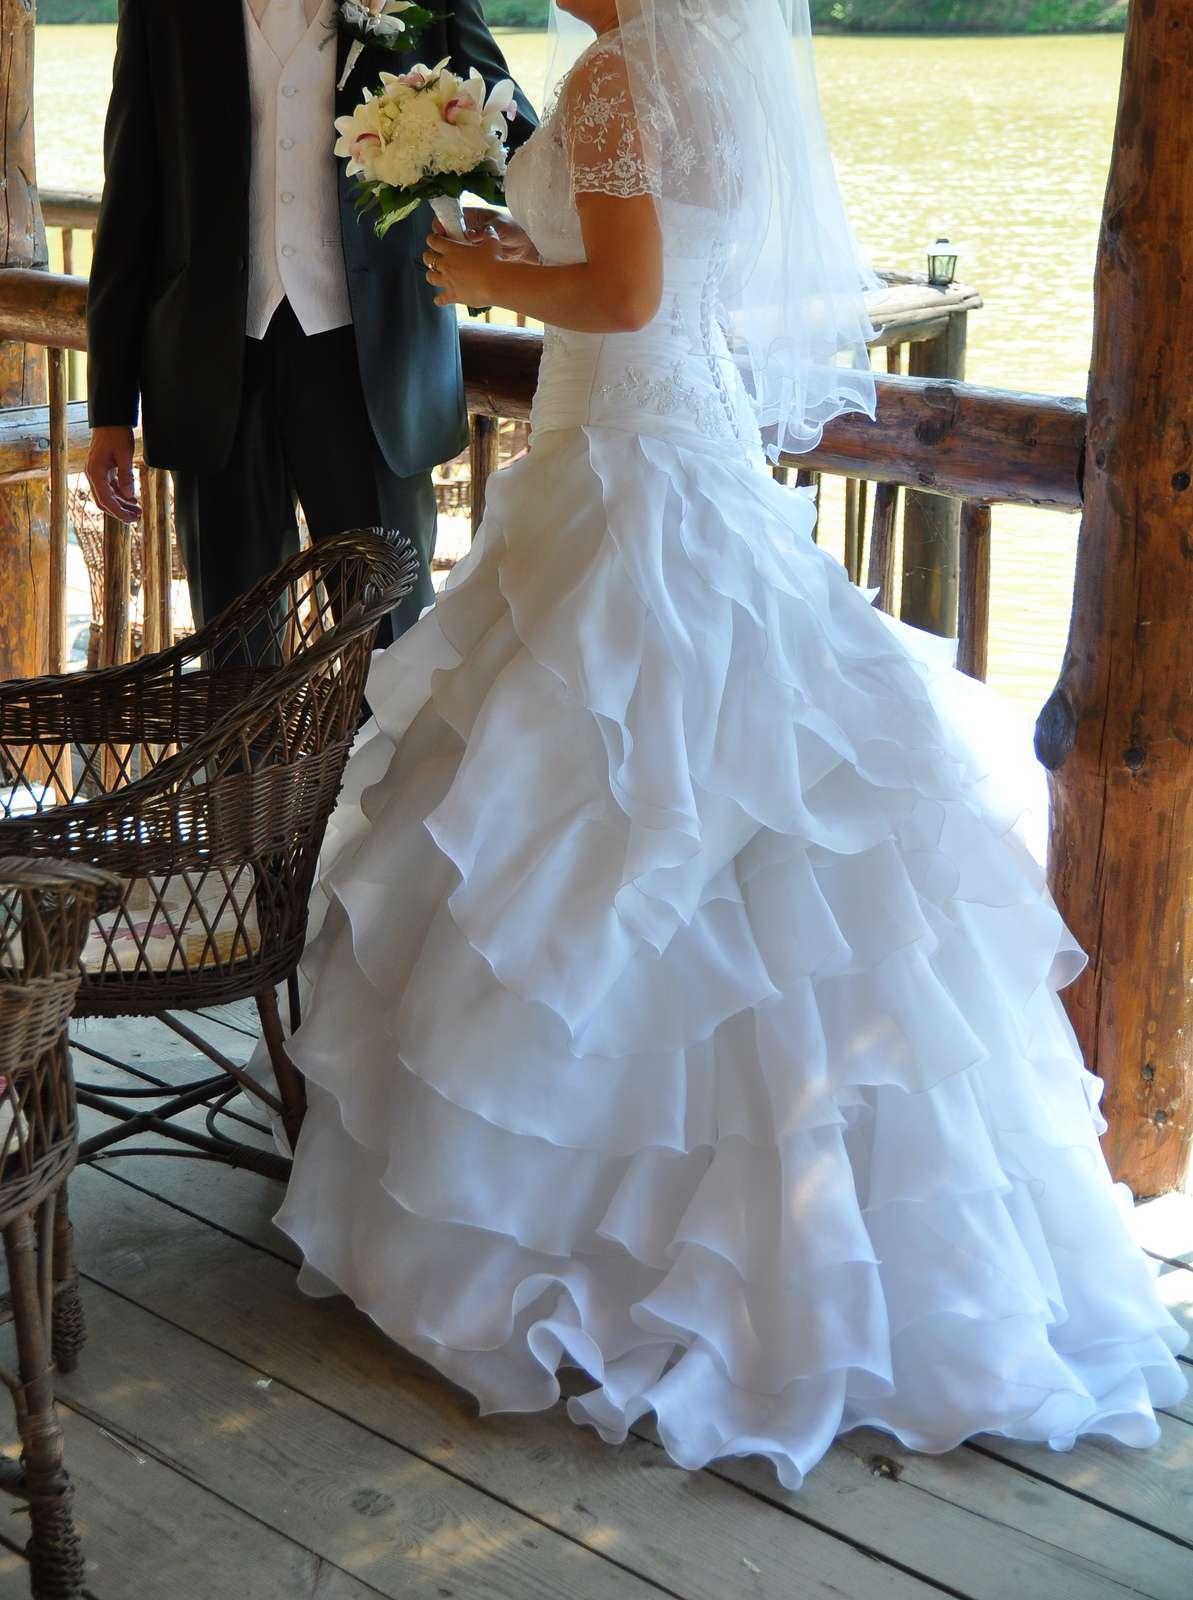 Svadobné šaty Elianna Moore model Bailaza originál - Obrázok č. 1